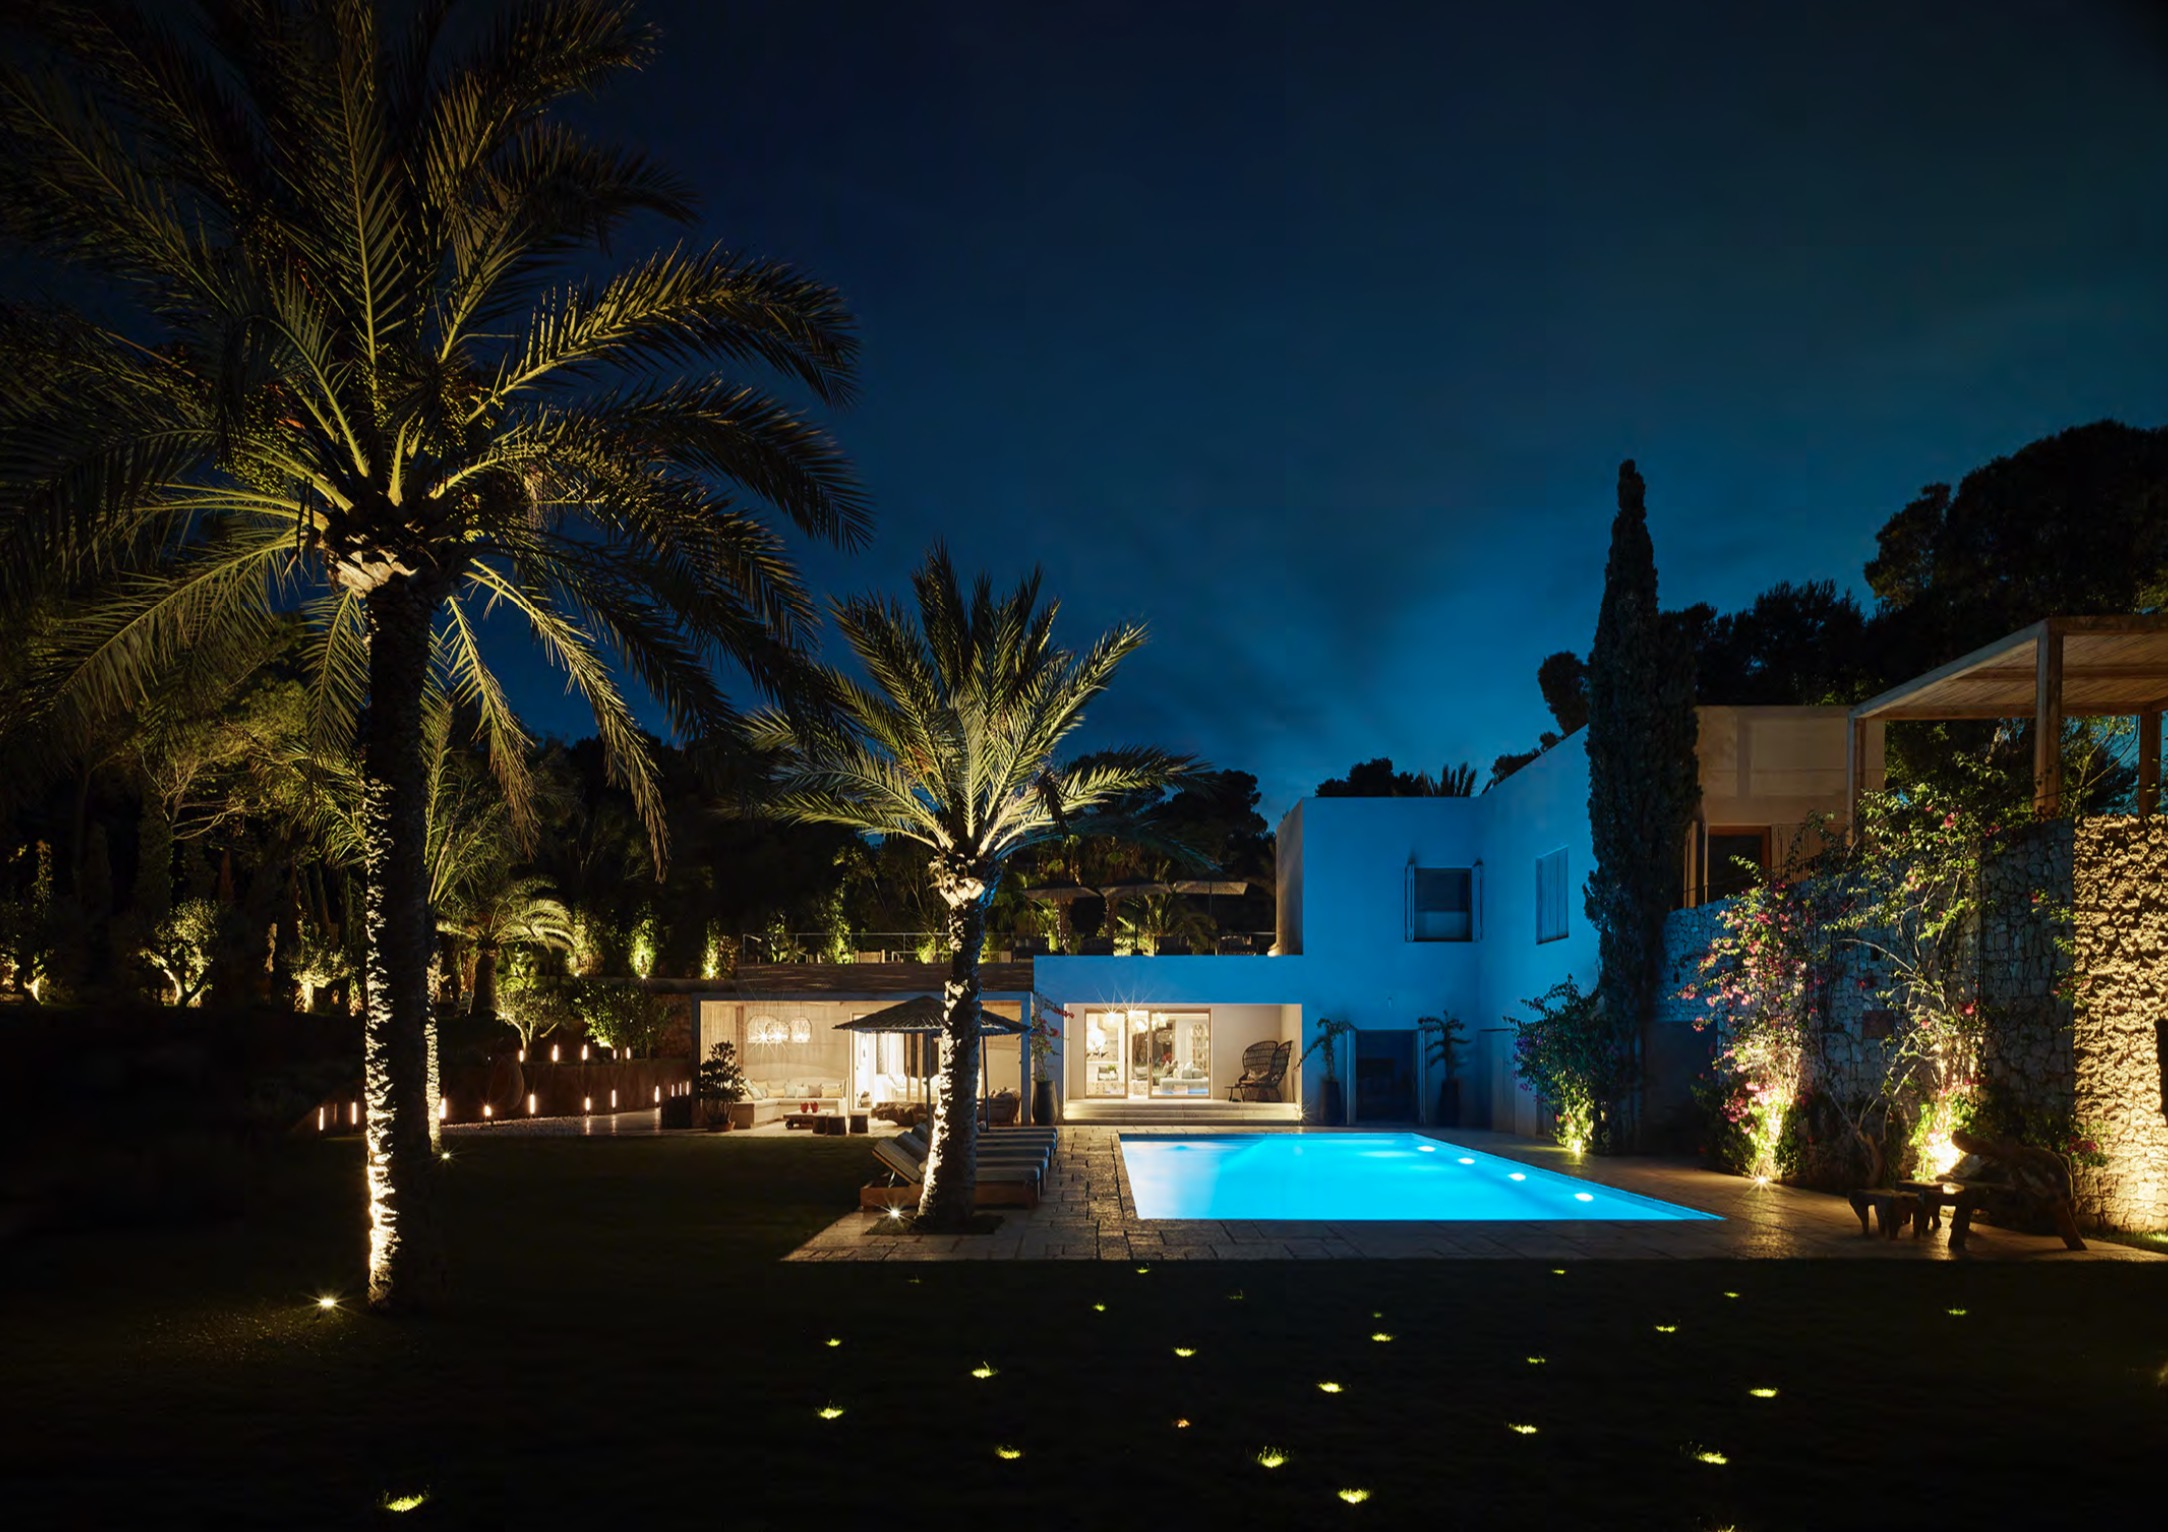 Outdoor lighting private villa